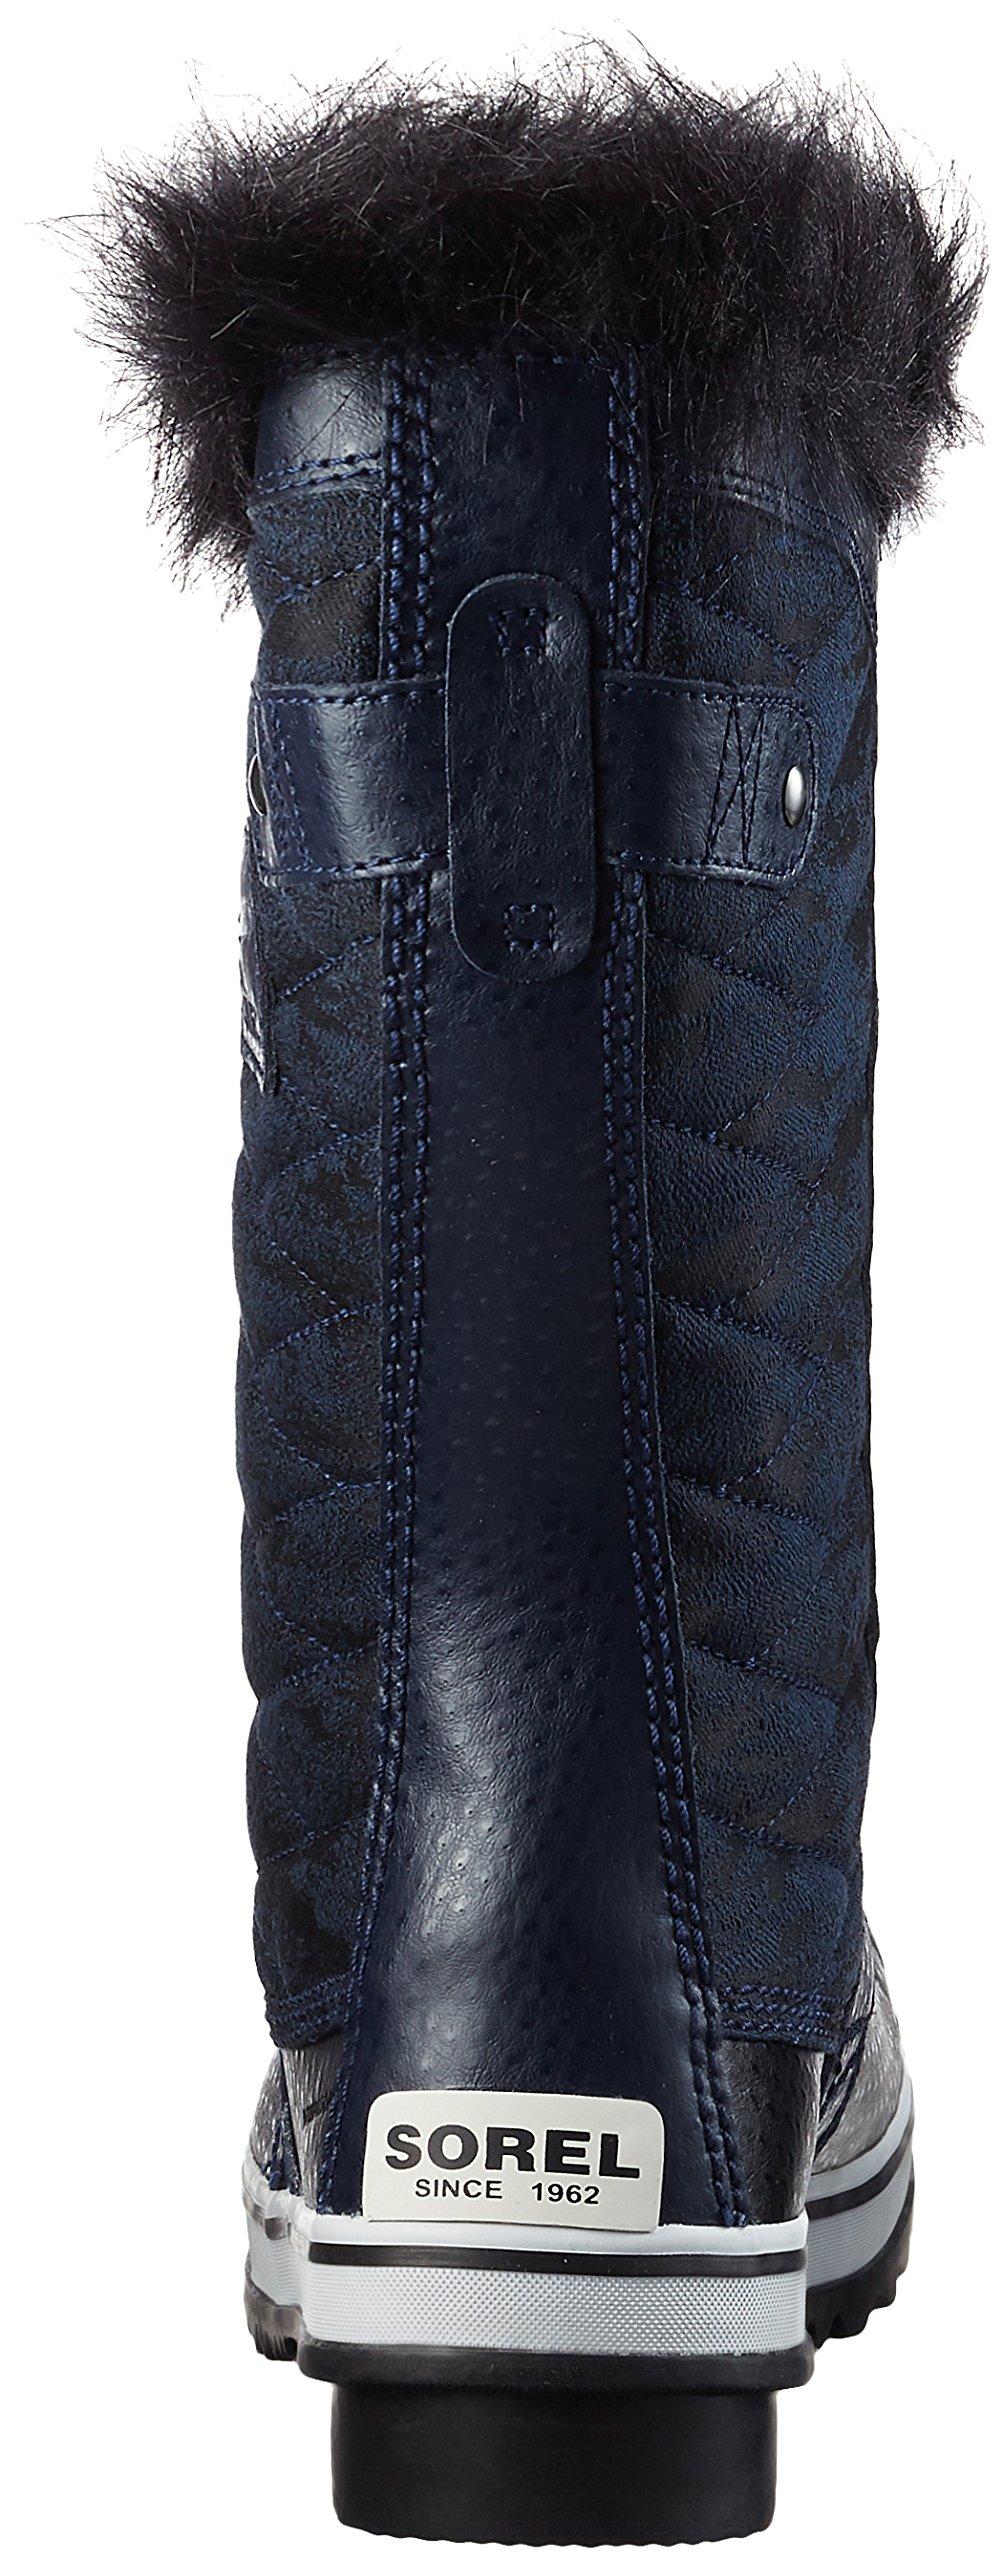 SOREL Women's 10.25 in. Tofino II Waterproof Boots, Collegiate Navy/Glare Blue 9 by SOREL (Image #2)